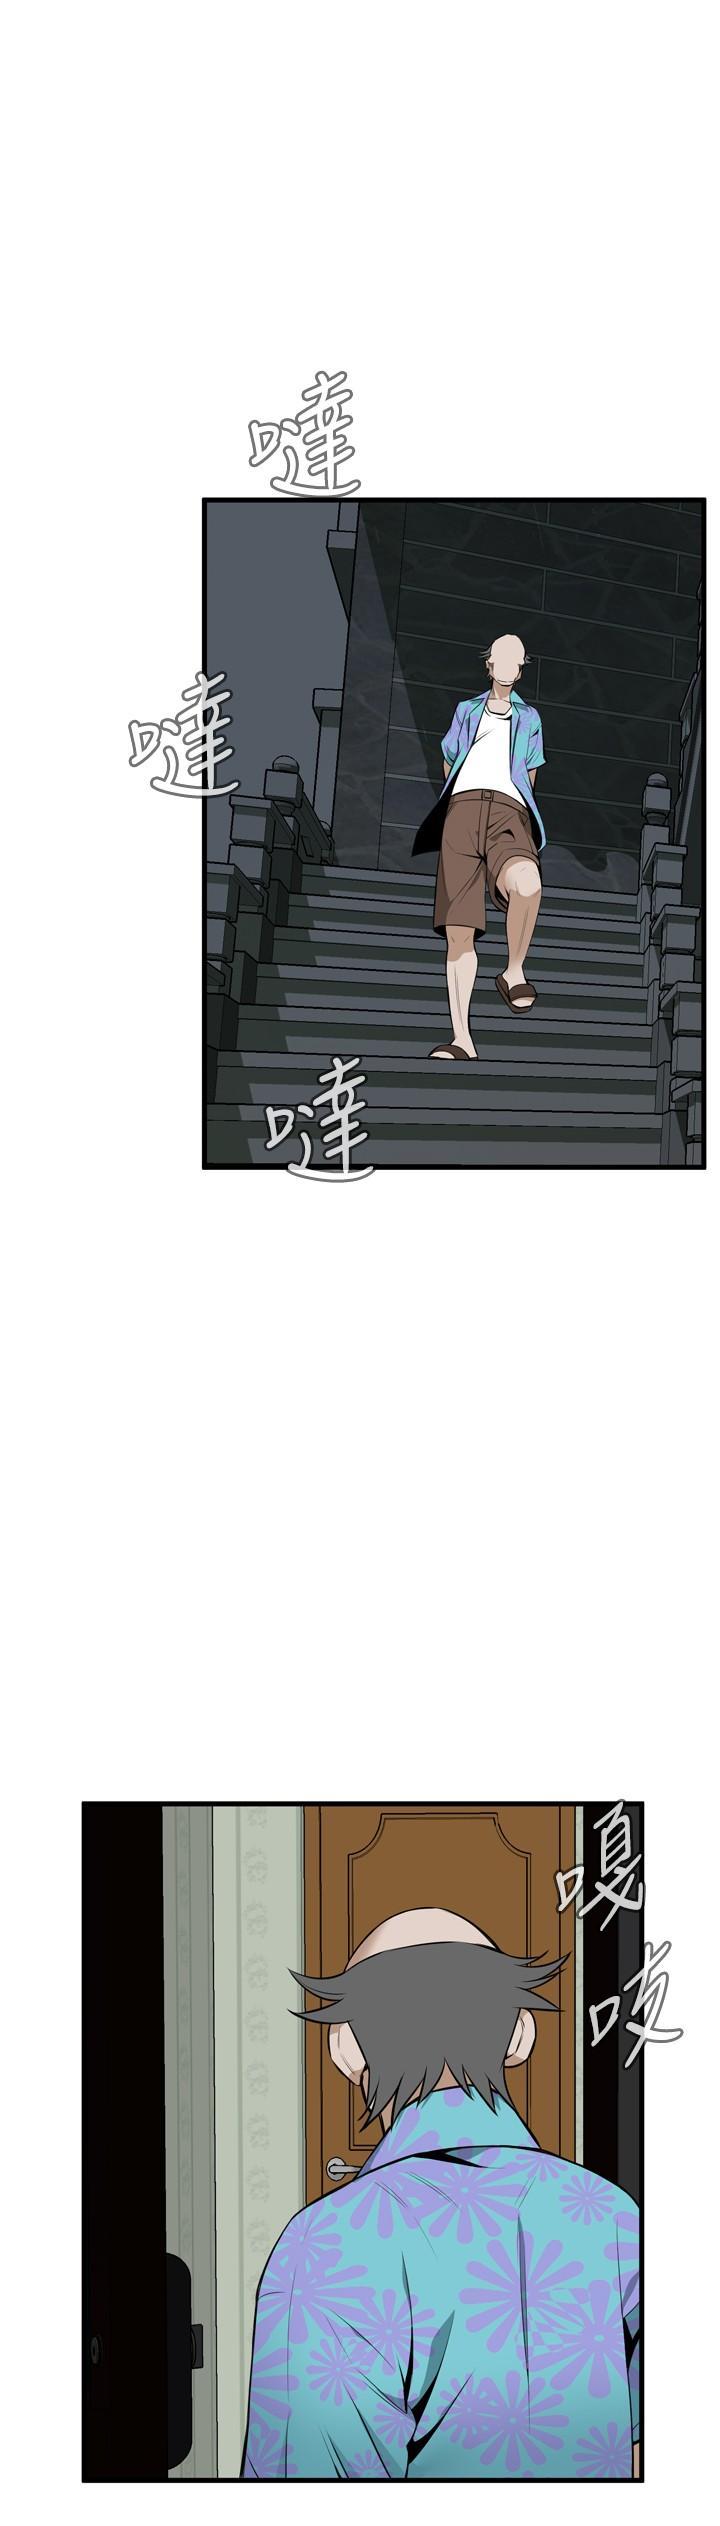 Take a Peek 偷窥 Ch.39~60 [Chinese]中文 142